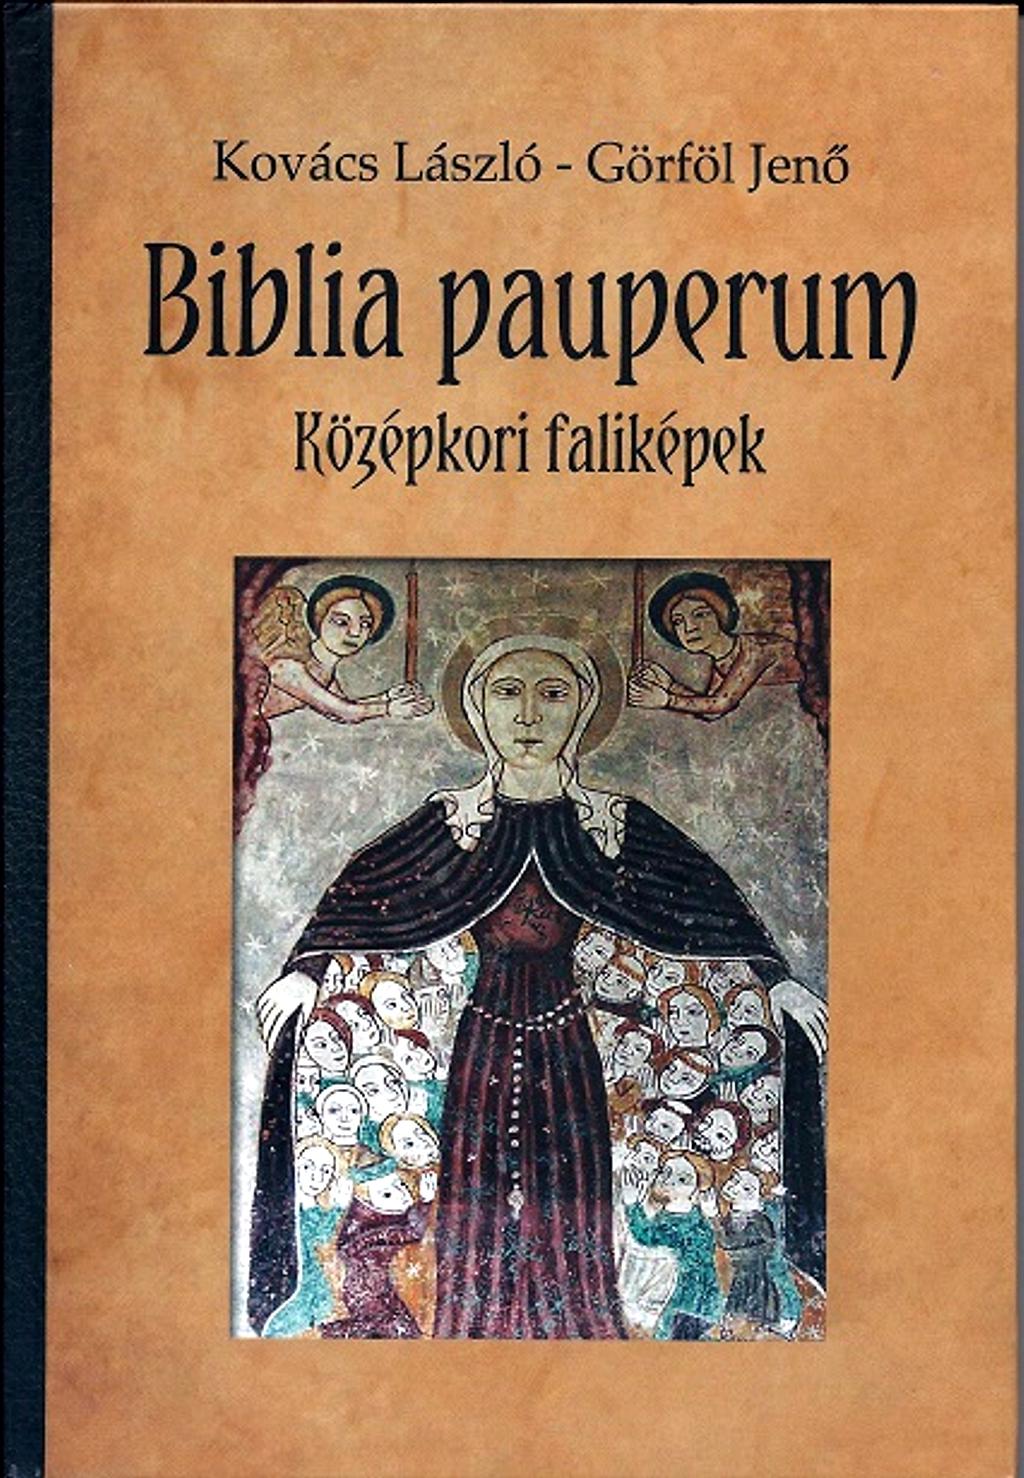 rozsnyo-biblia-kovacs-laszlo-2016